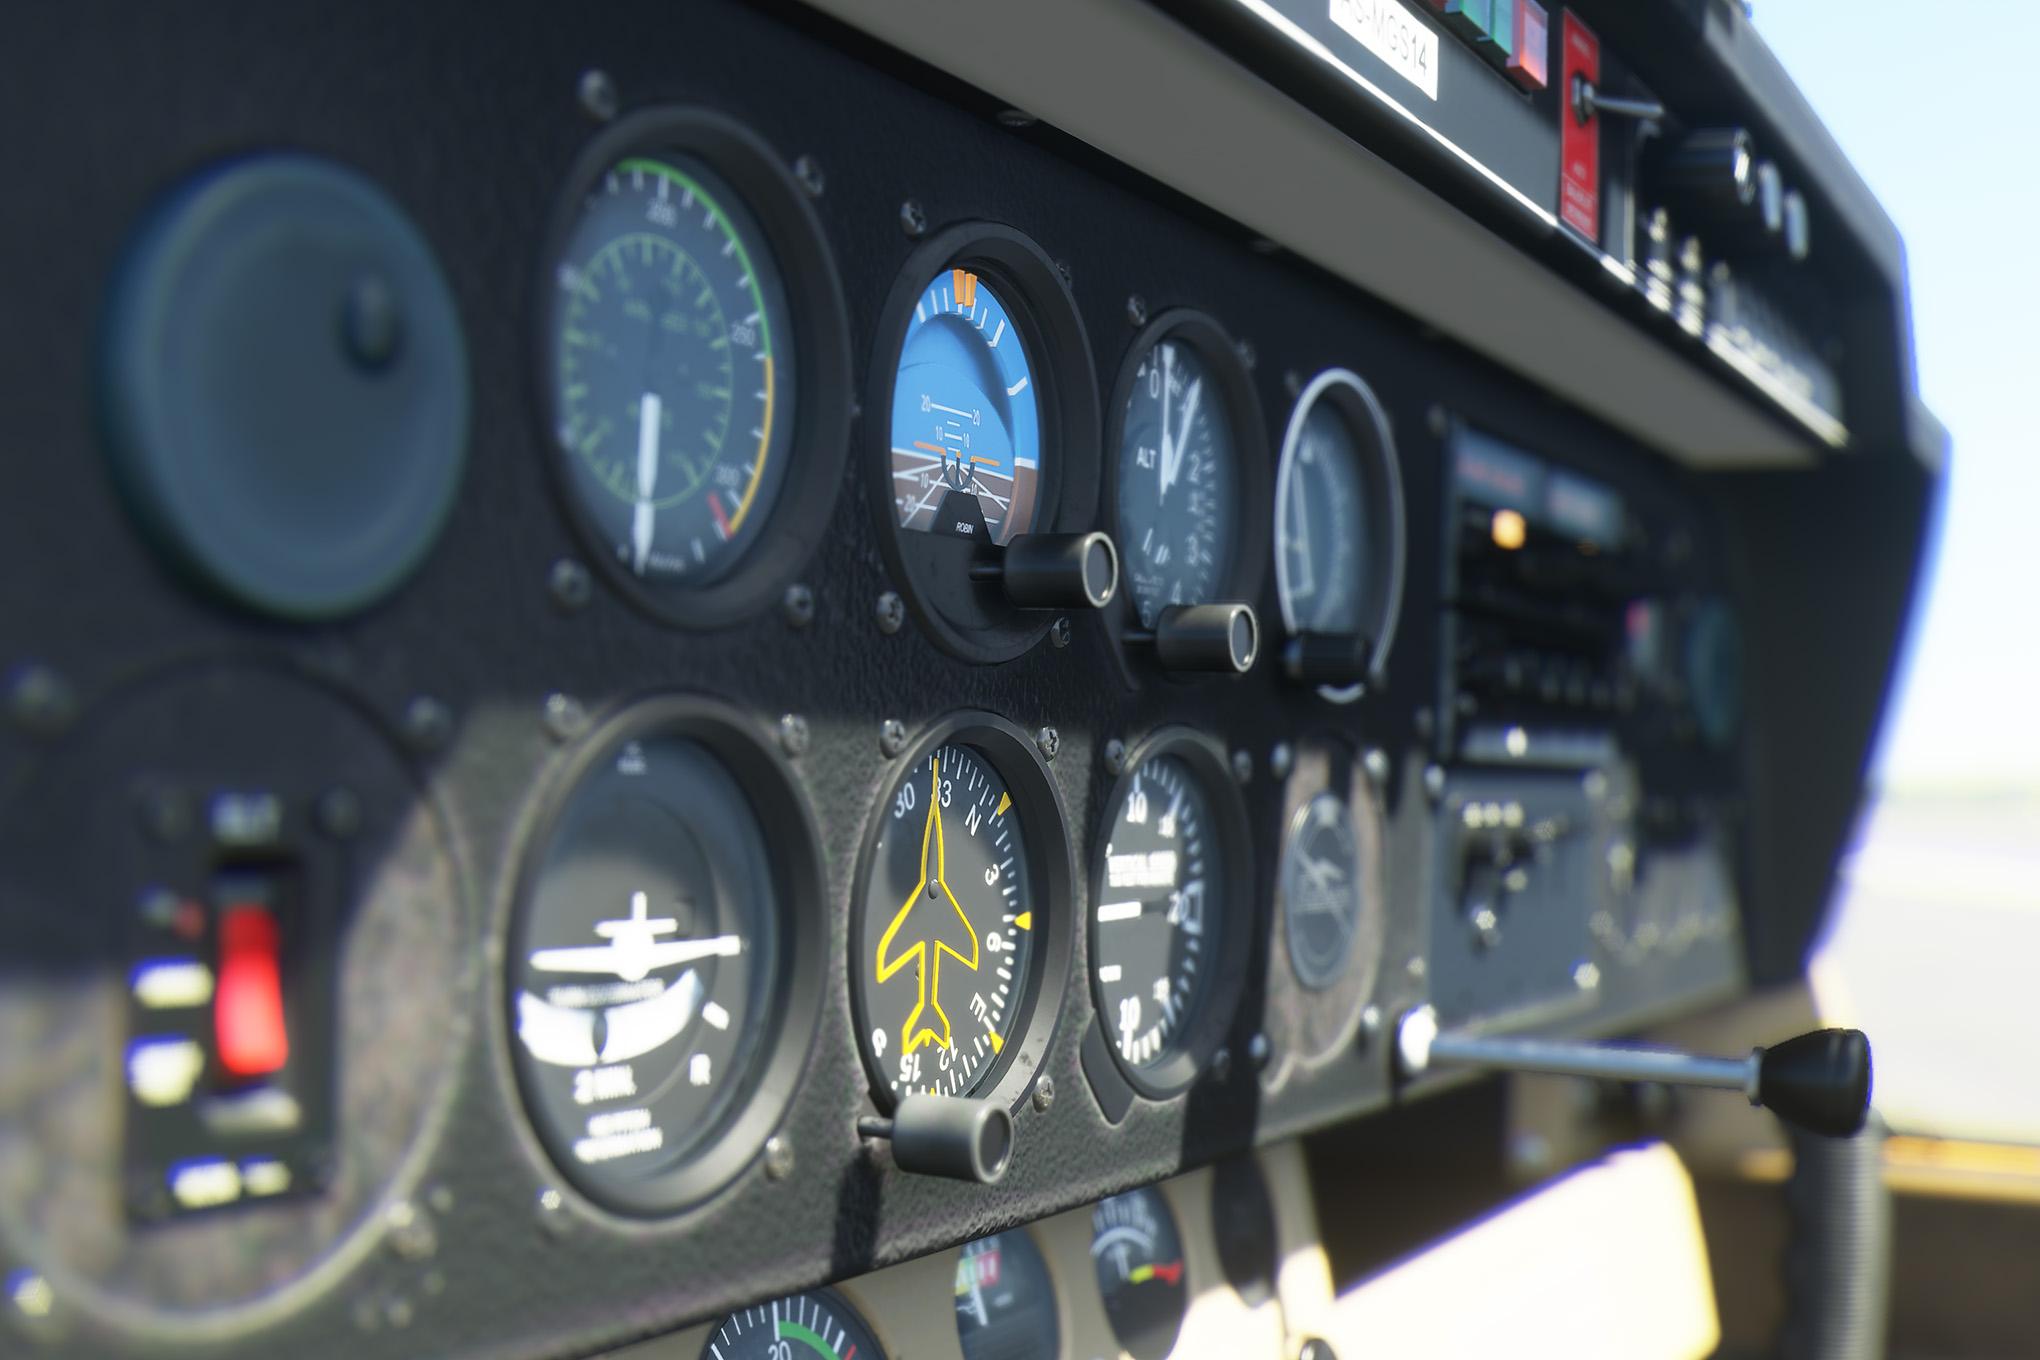 Microsoft Flight Simulator devs offering invites to closed alpha